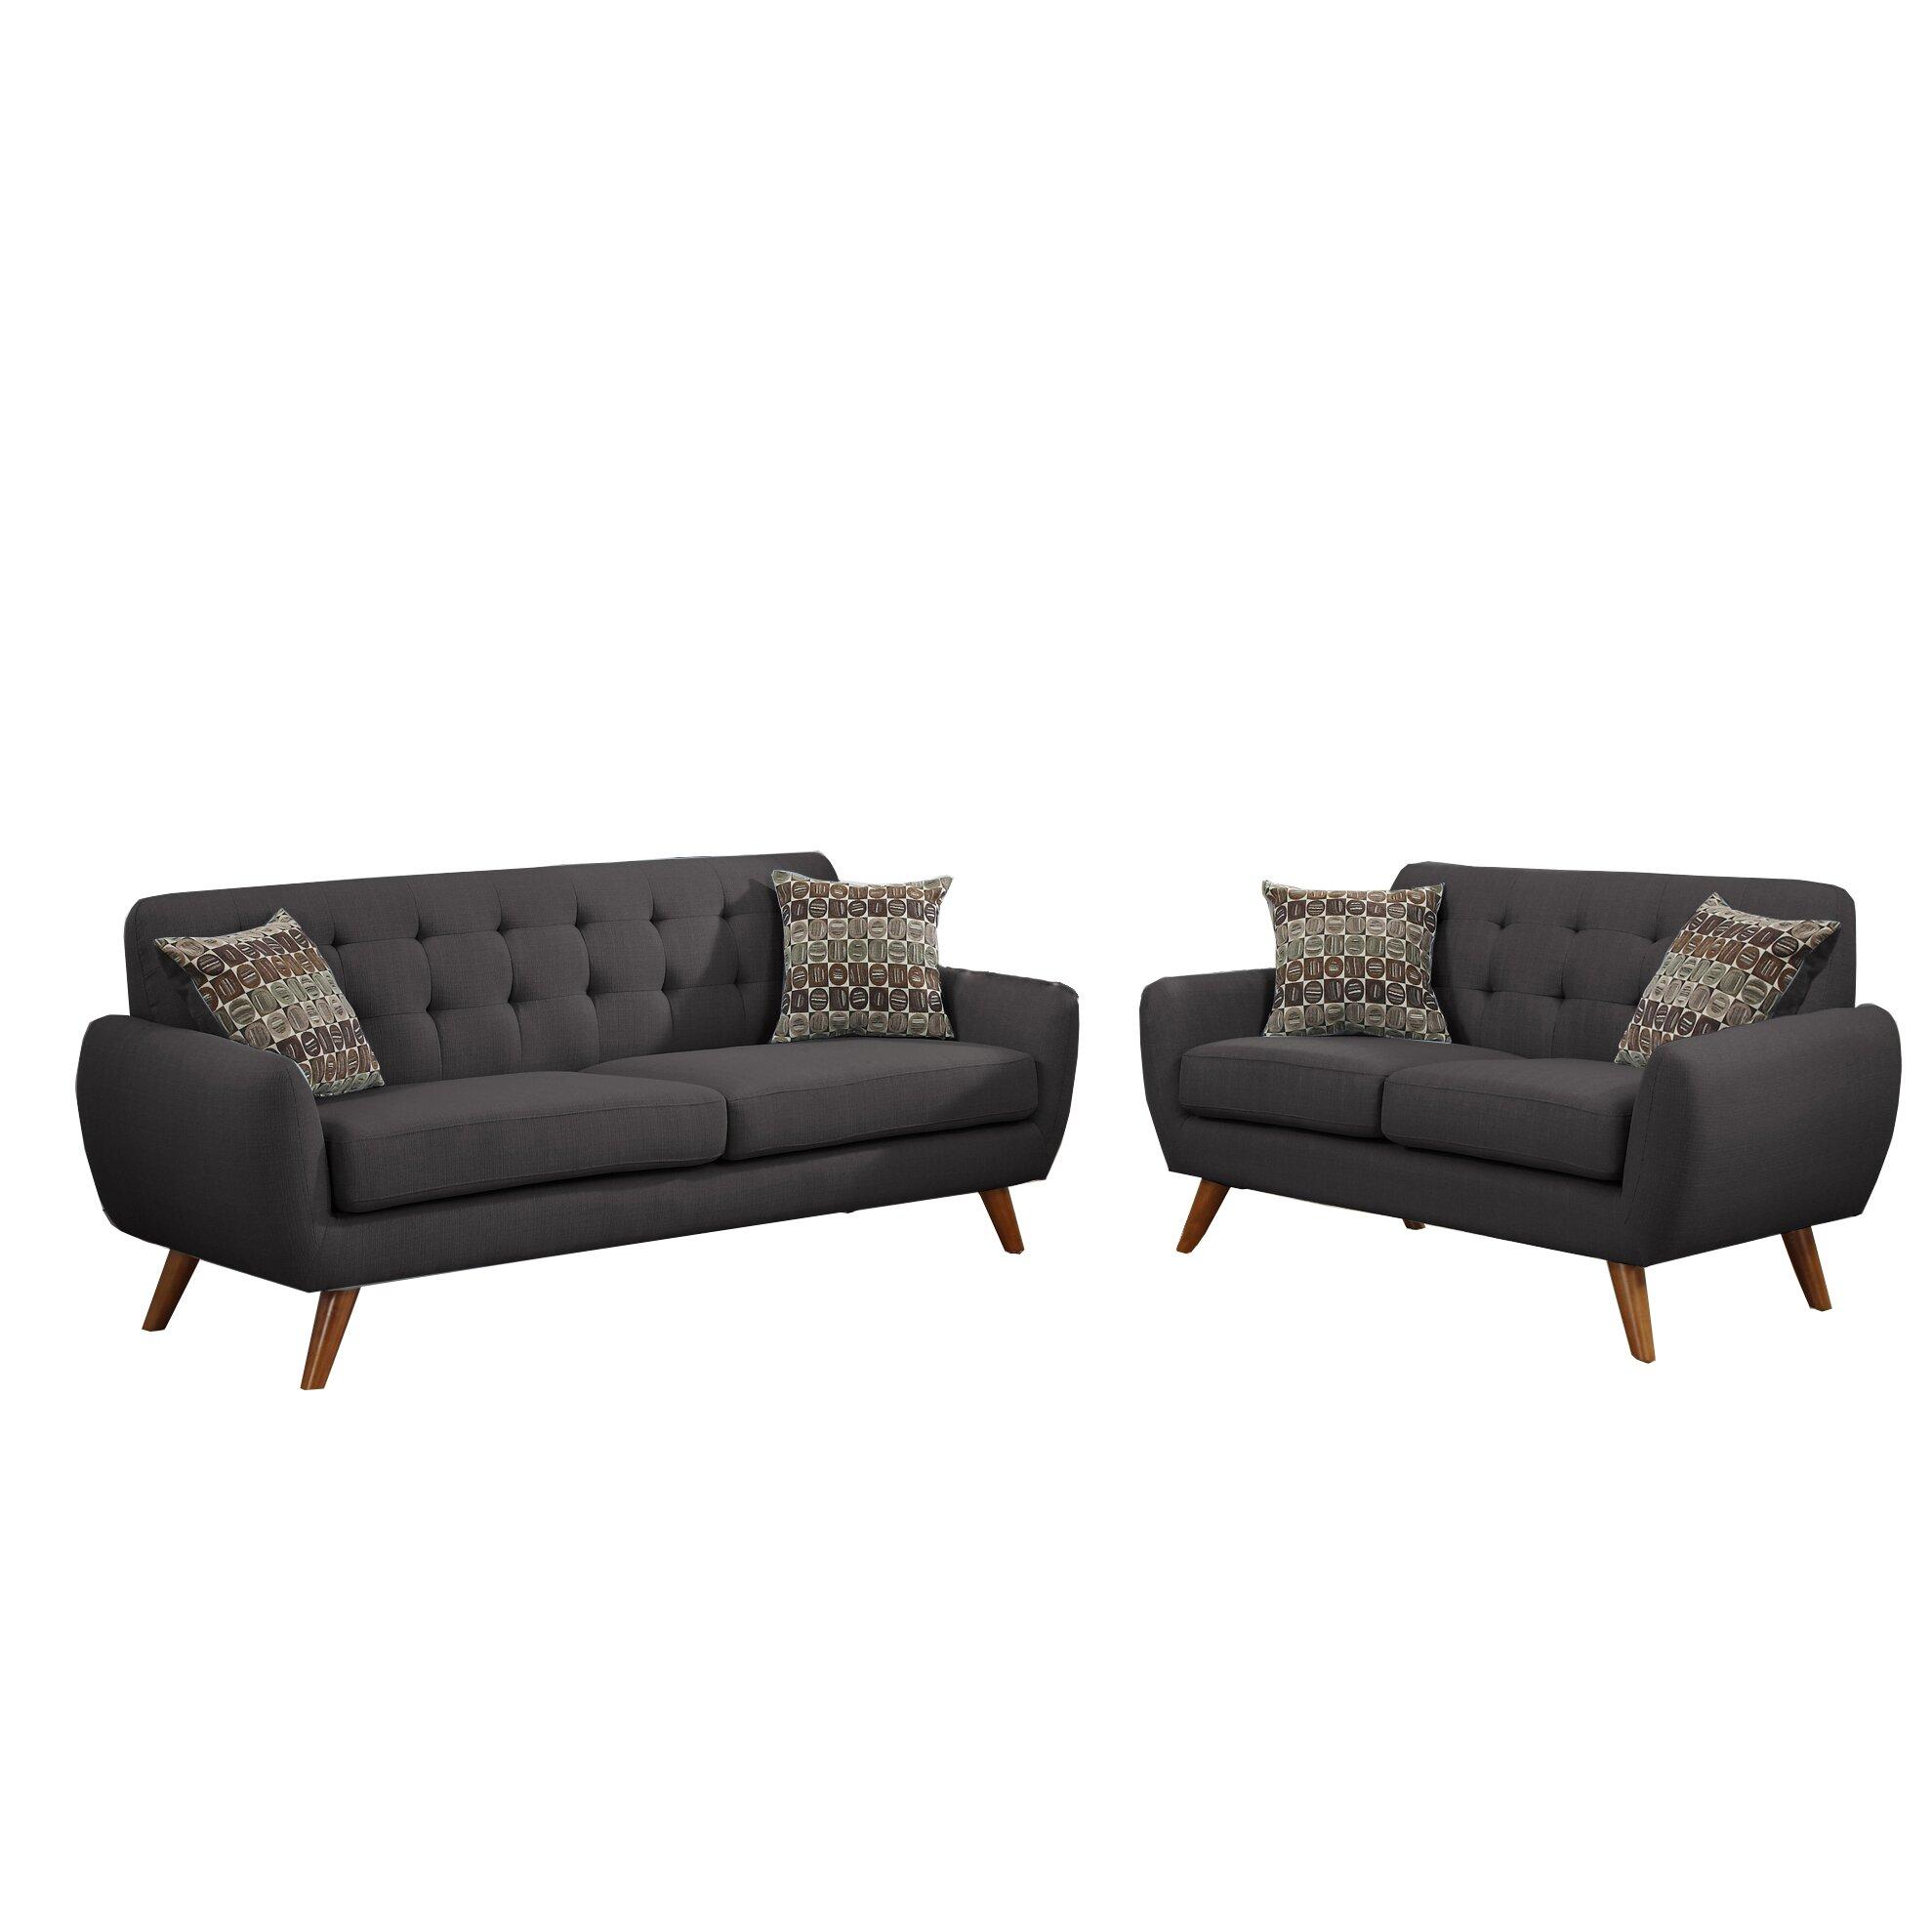 Poundex bobkona sonya 2 piece sofa and loveseat set for Bobkona atlantic 2 piece sectional sofa